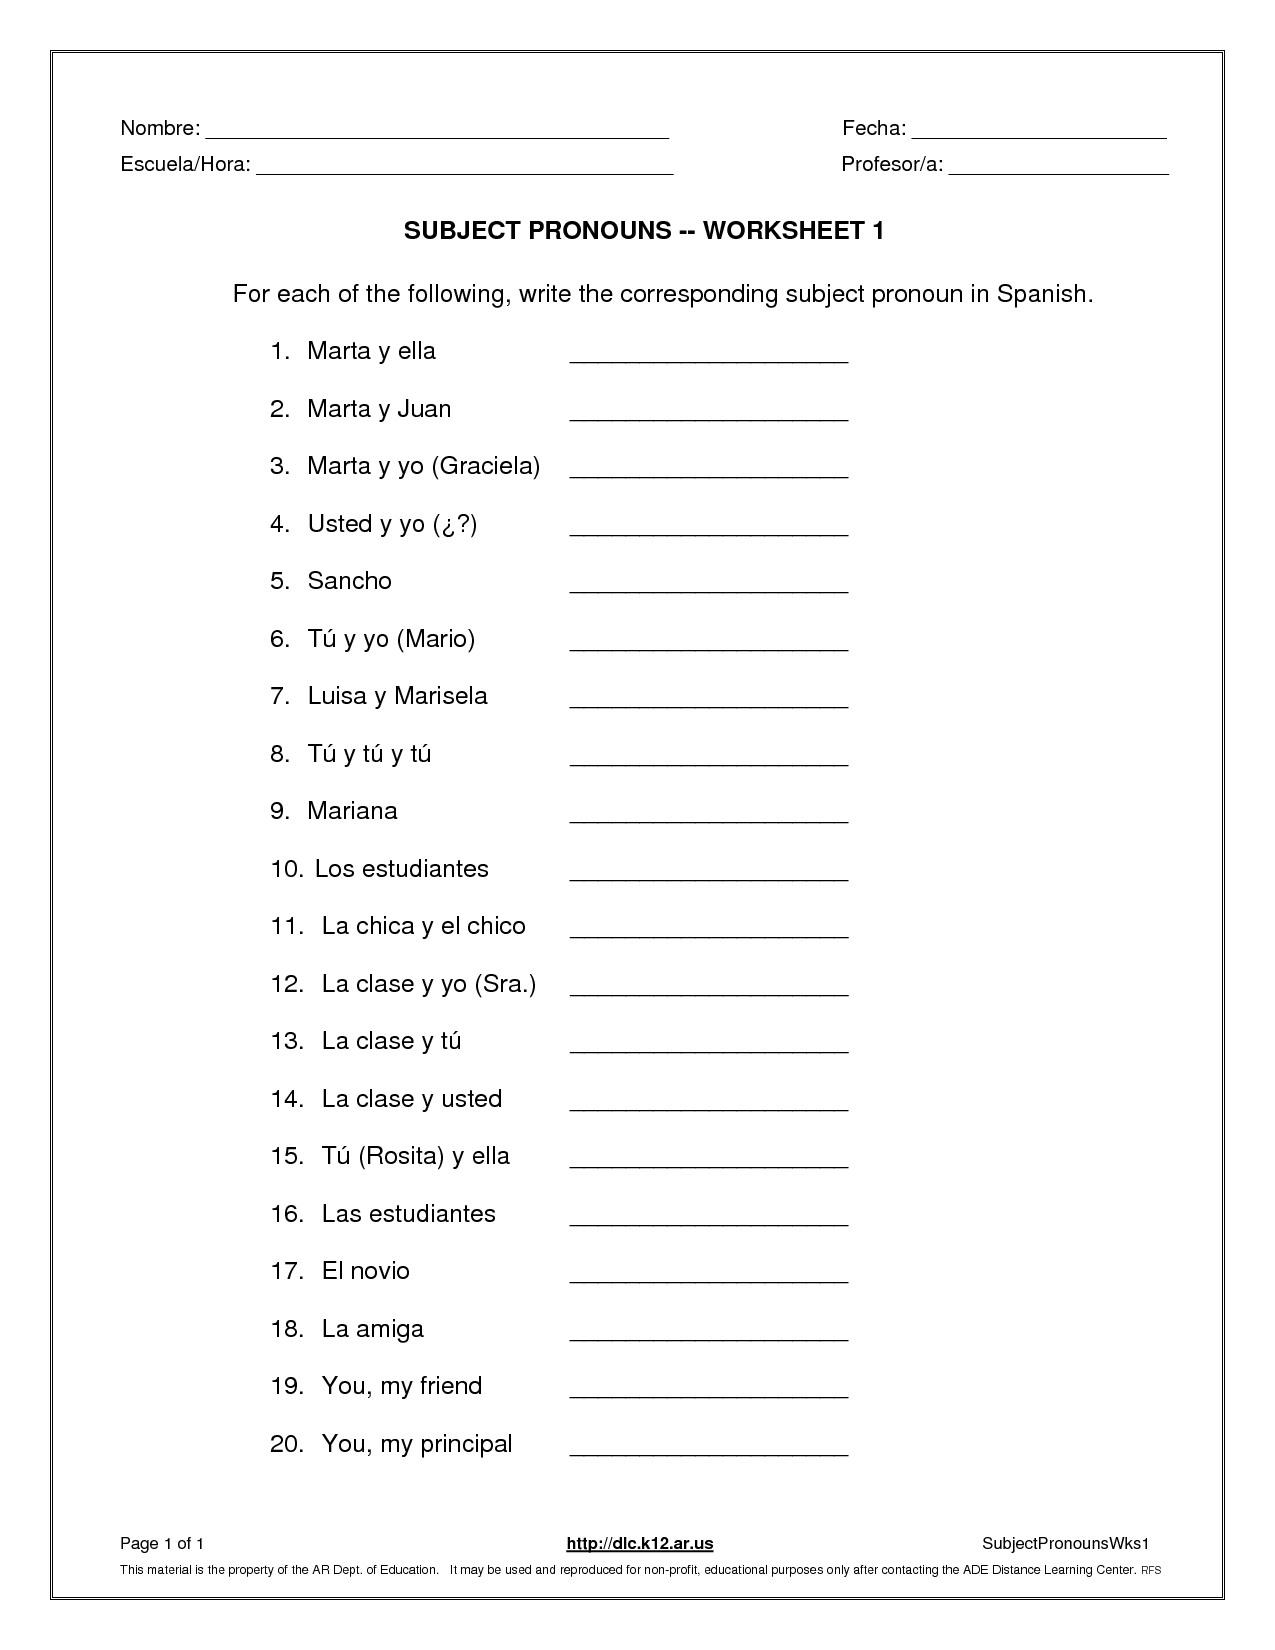 Subject And Object Pronouns Worksheet Subject Pronouns